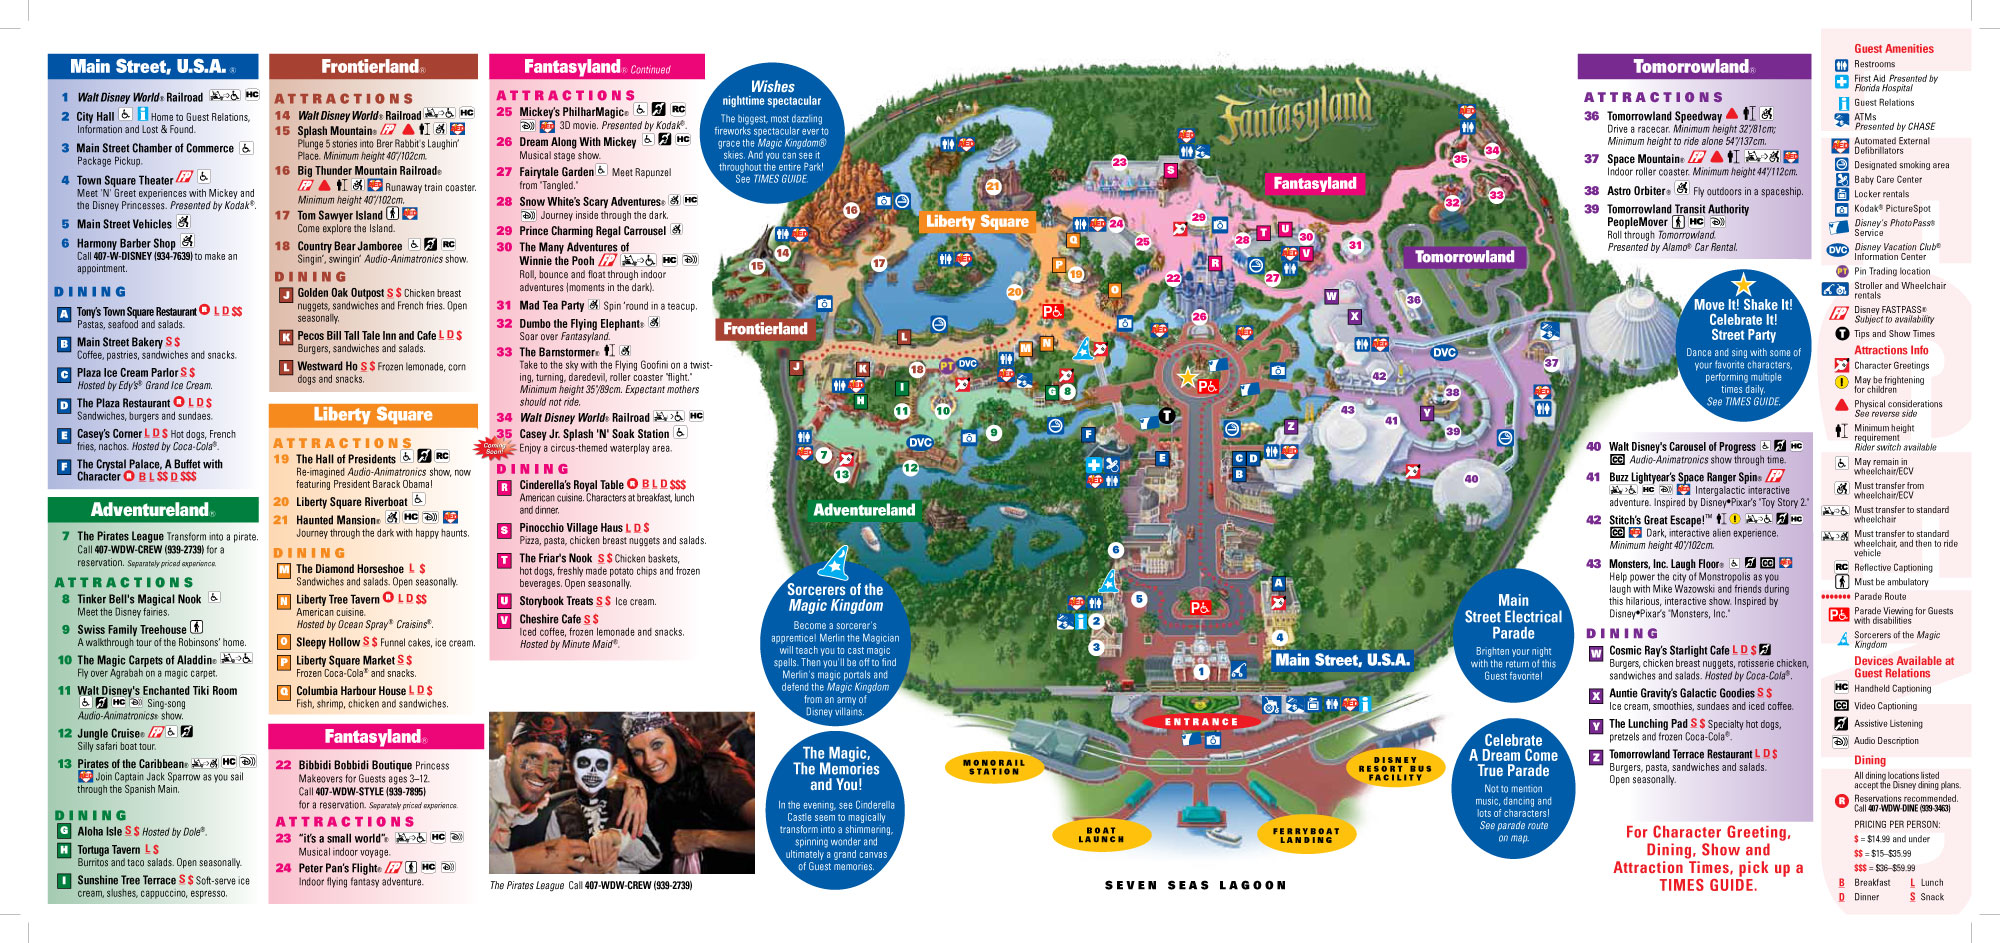 Walt Disney World Best Travel Destinations of 2015